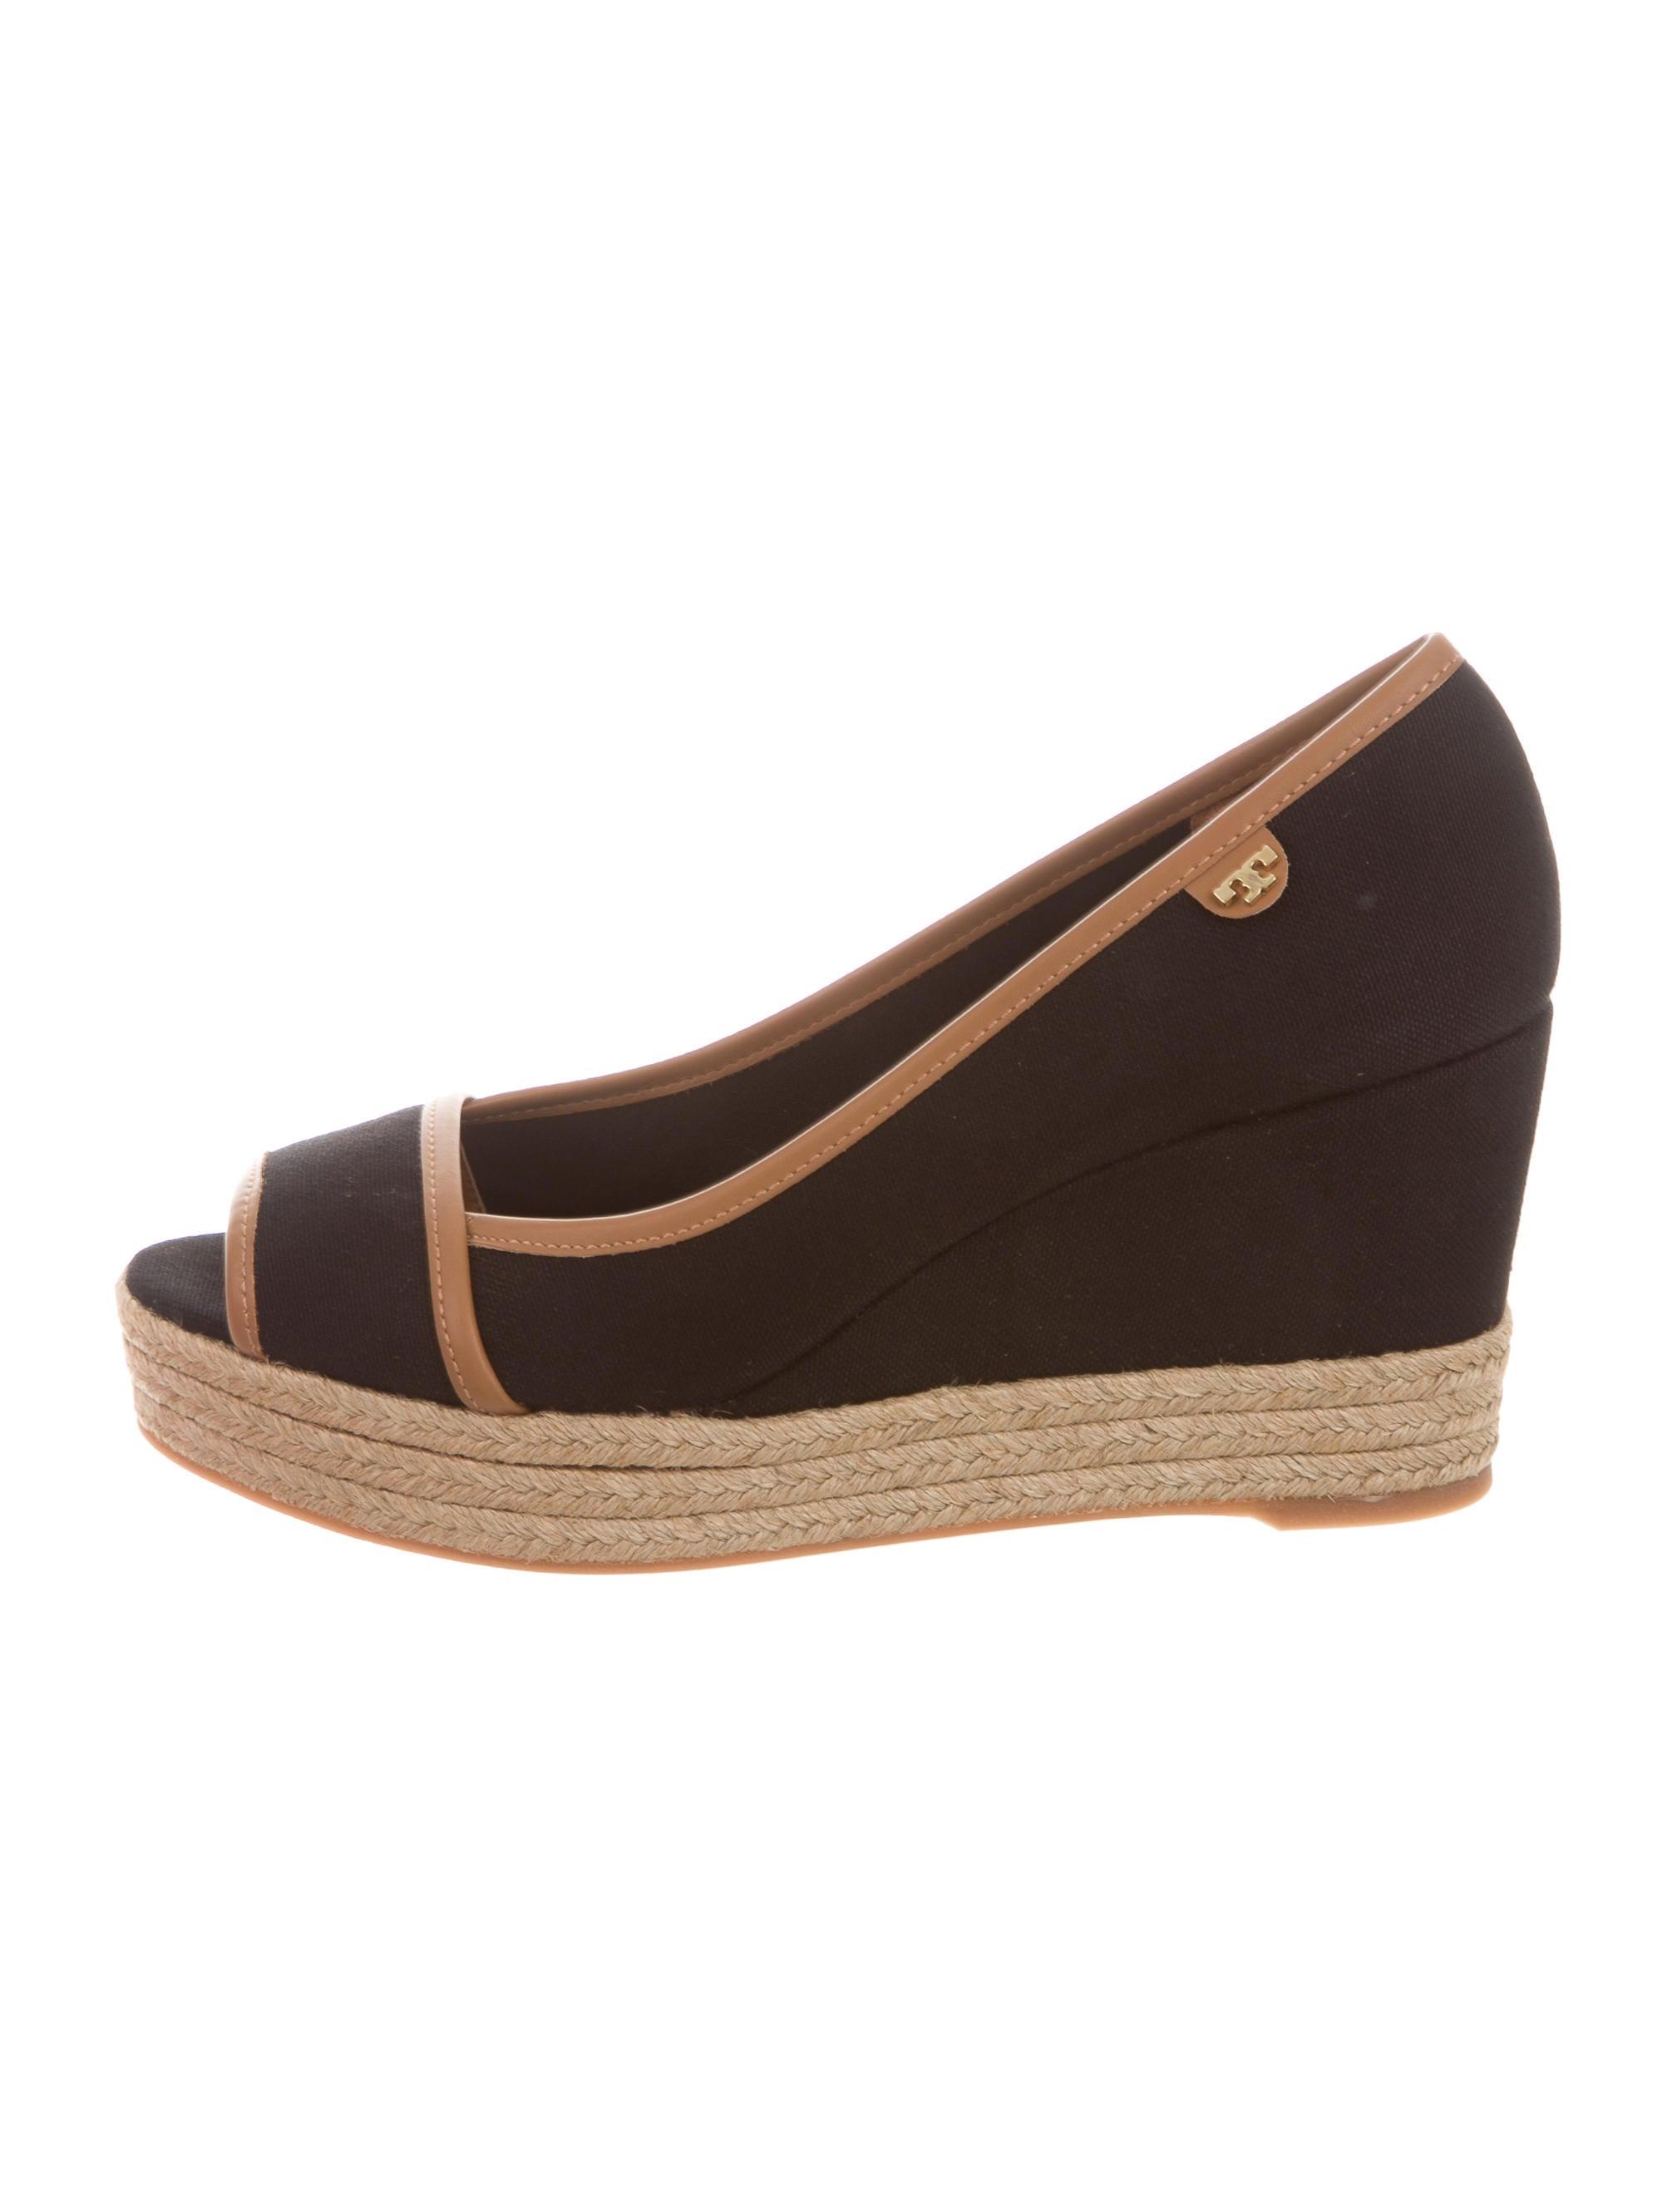 Contemporary Flatware Tory Burch Majorca Peep Toe Wedges Shoes Wto71620